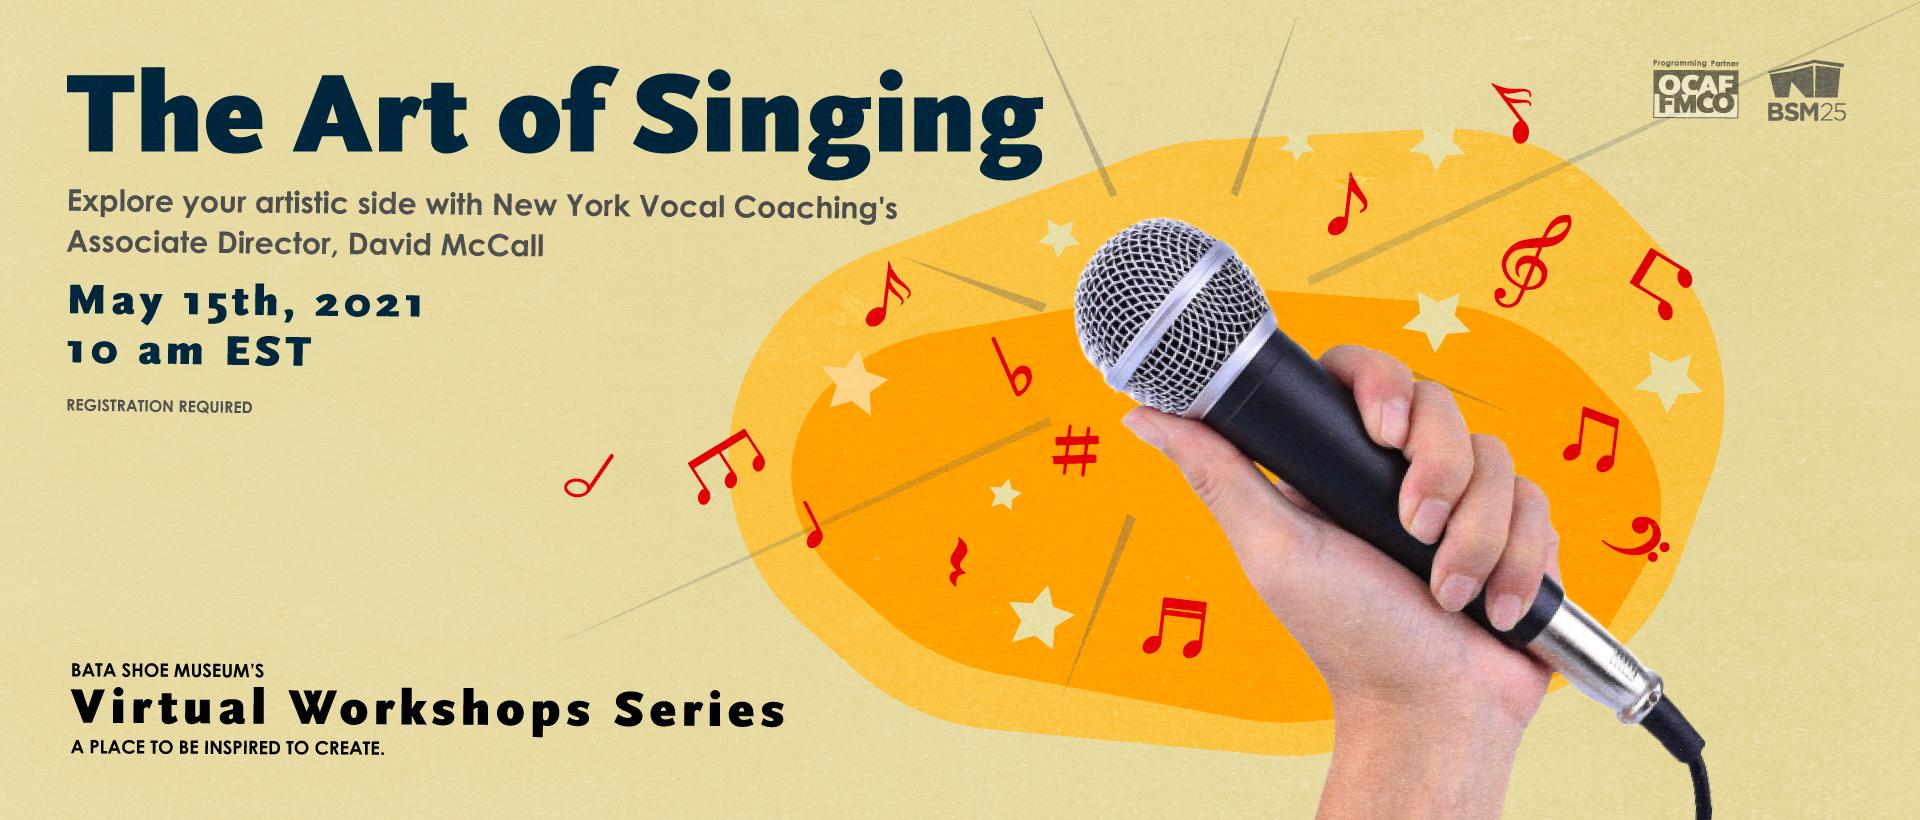 The art of singing workshop